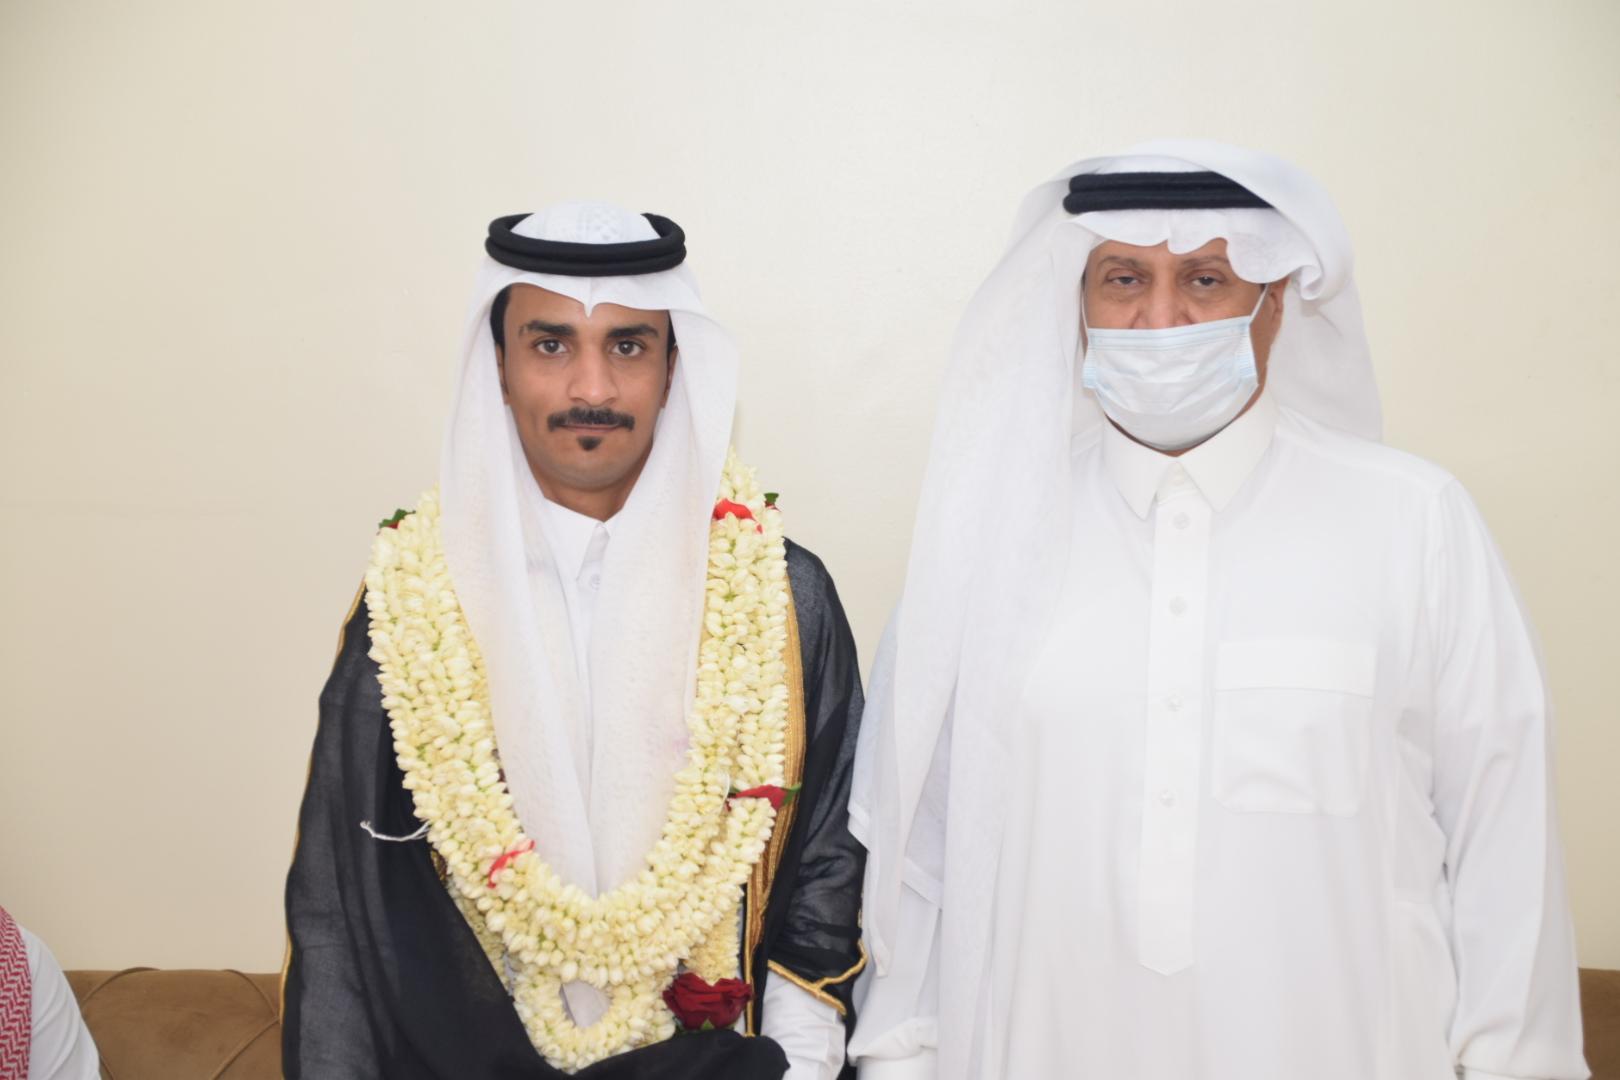 آل حمدي تحتفل بزواج ابنهم رامي في جازان - المواطن